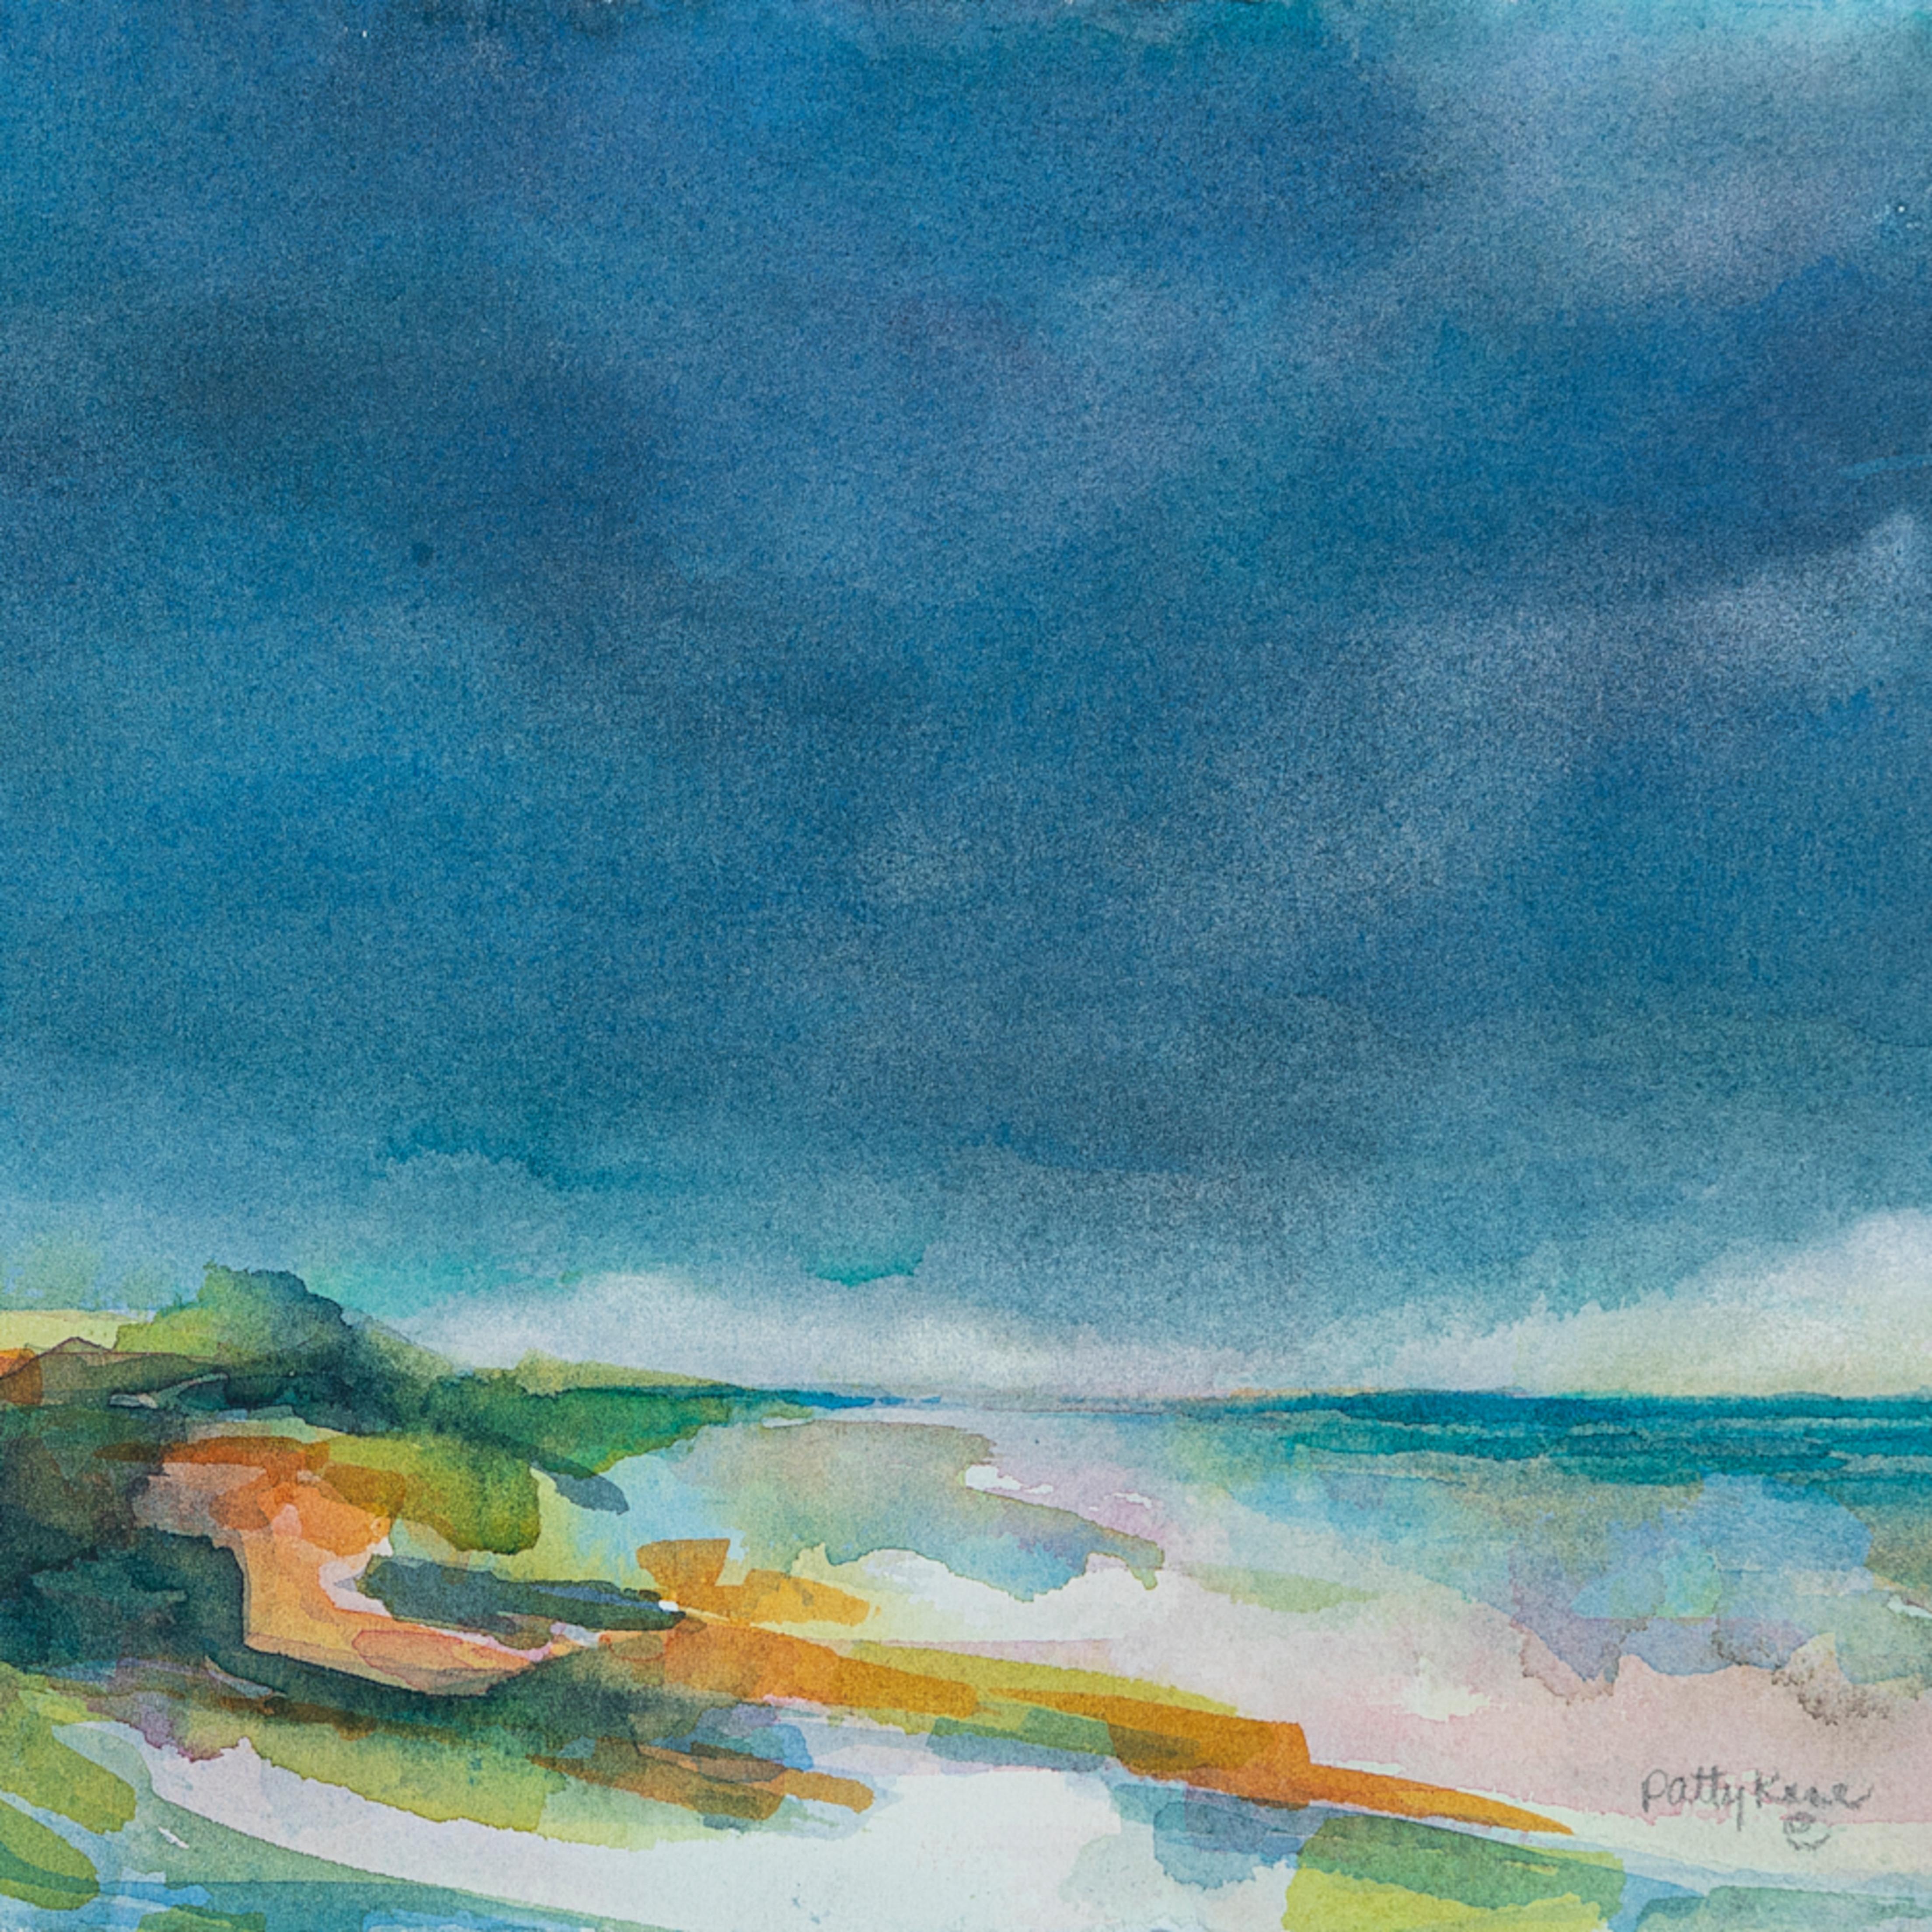 Storm on the horizon qlti1h